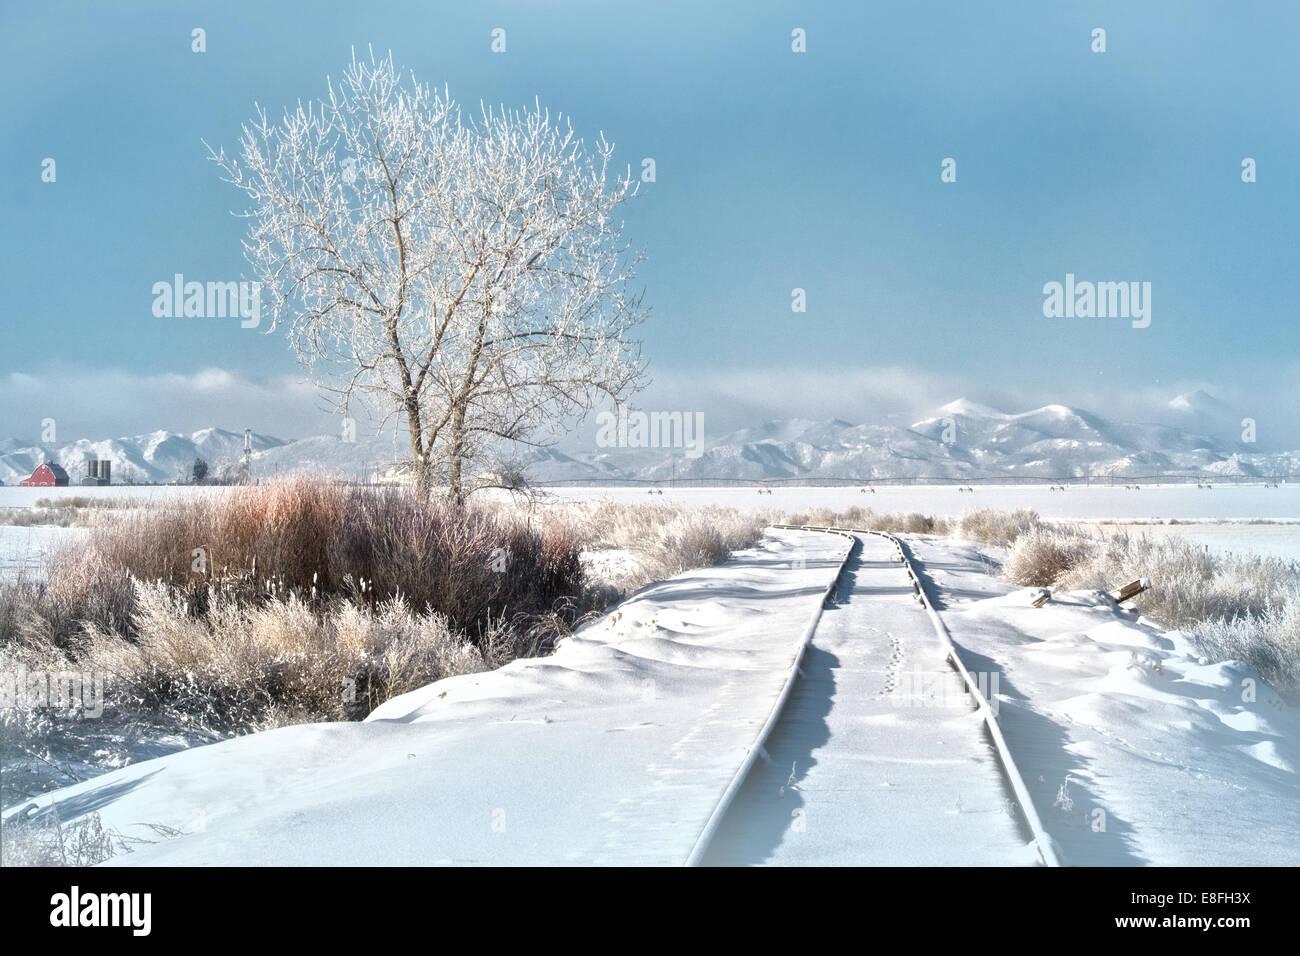 USA, Colorado, Snowy railroad tracks leading towards - Stock Image